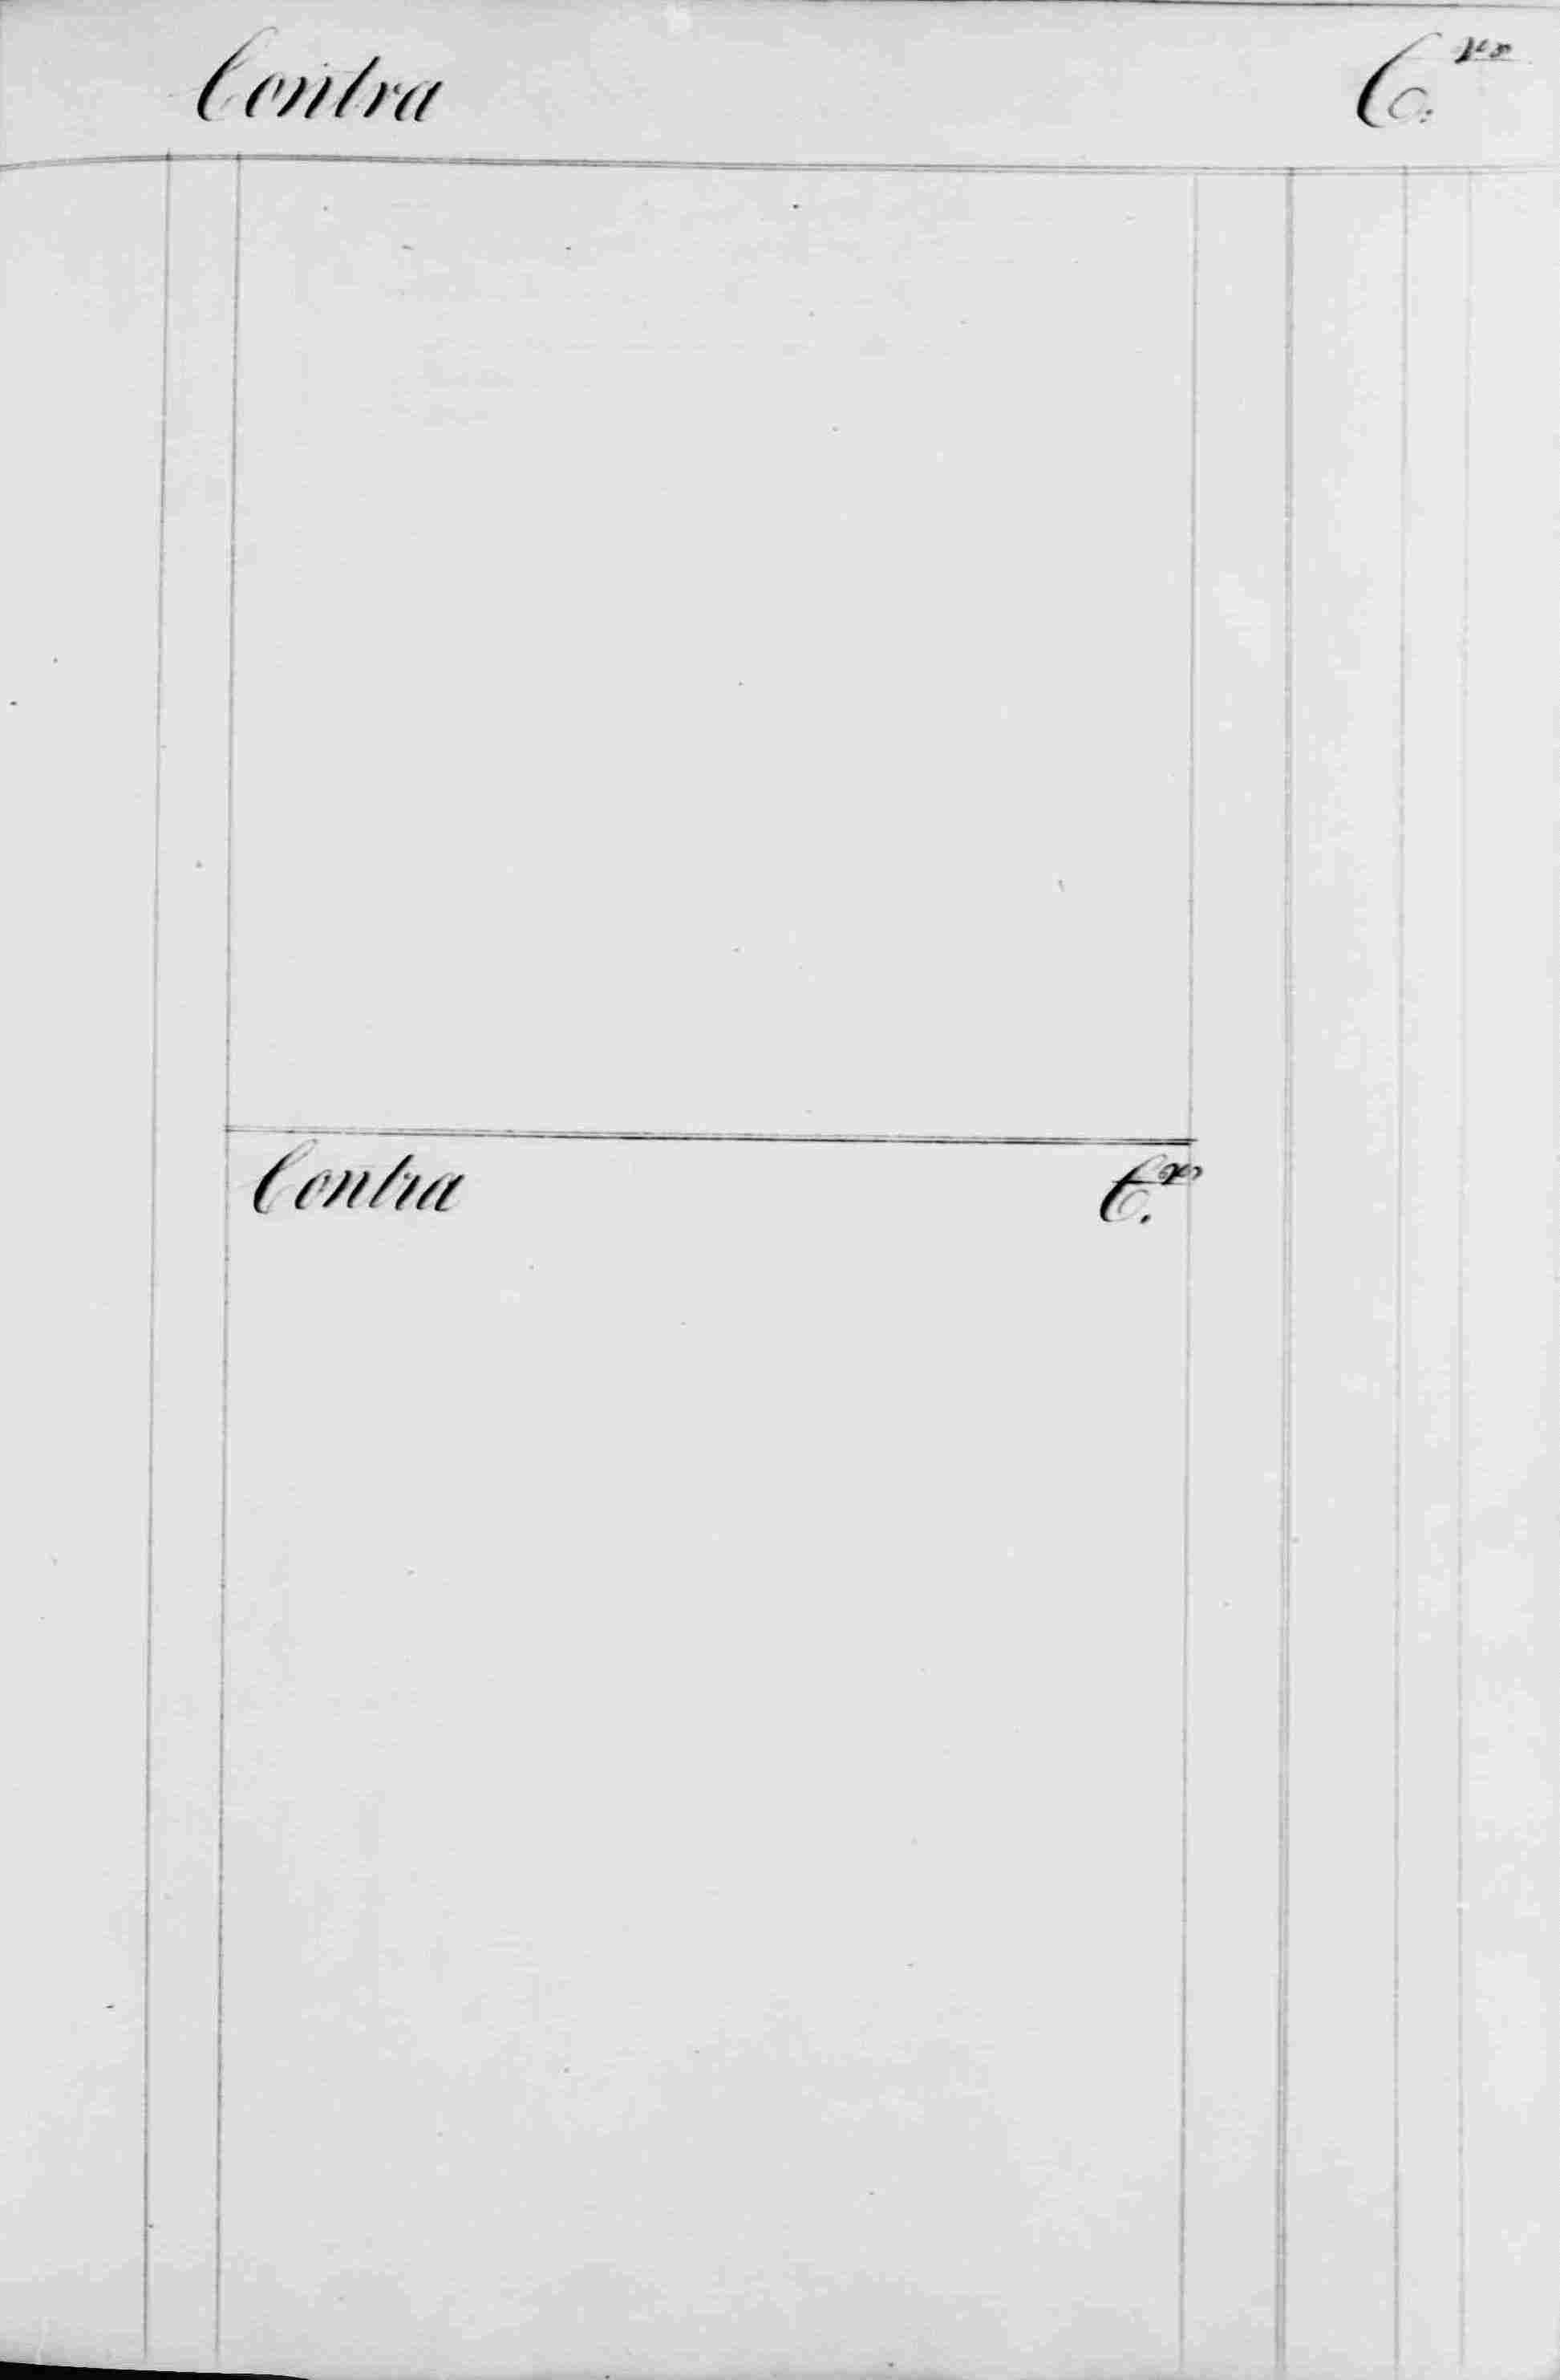 Ledger B, folio 297, right side